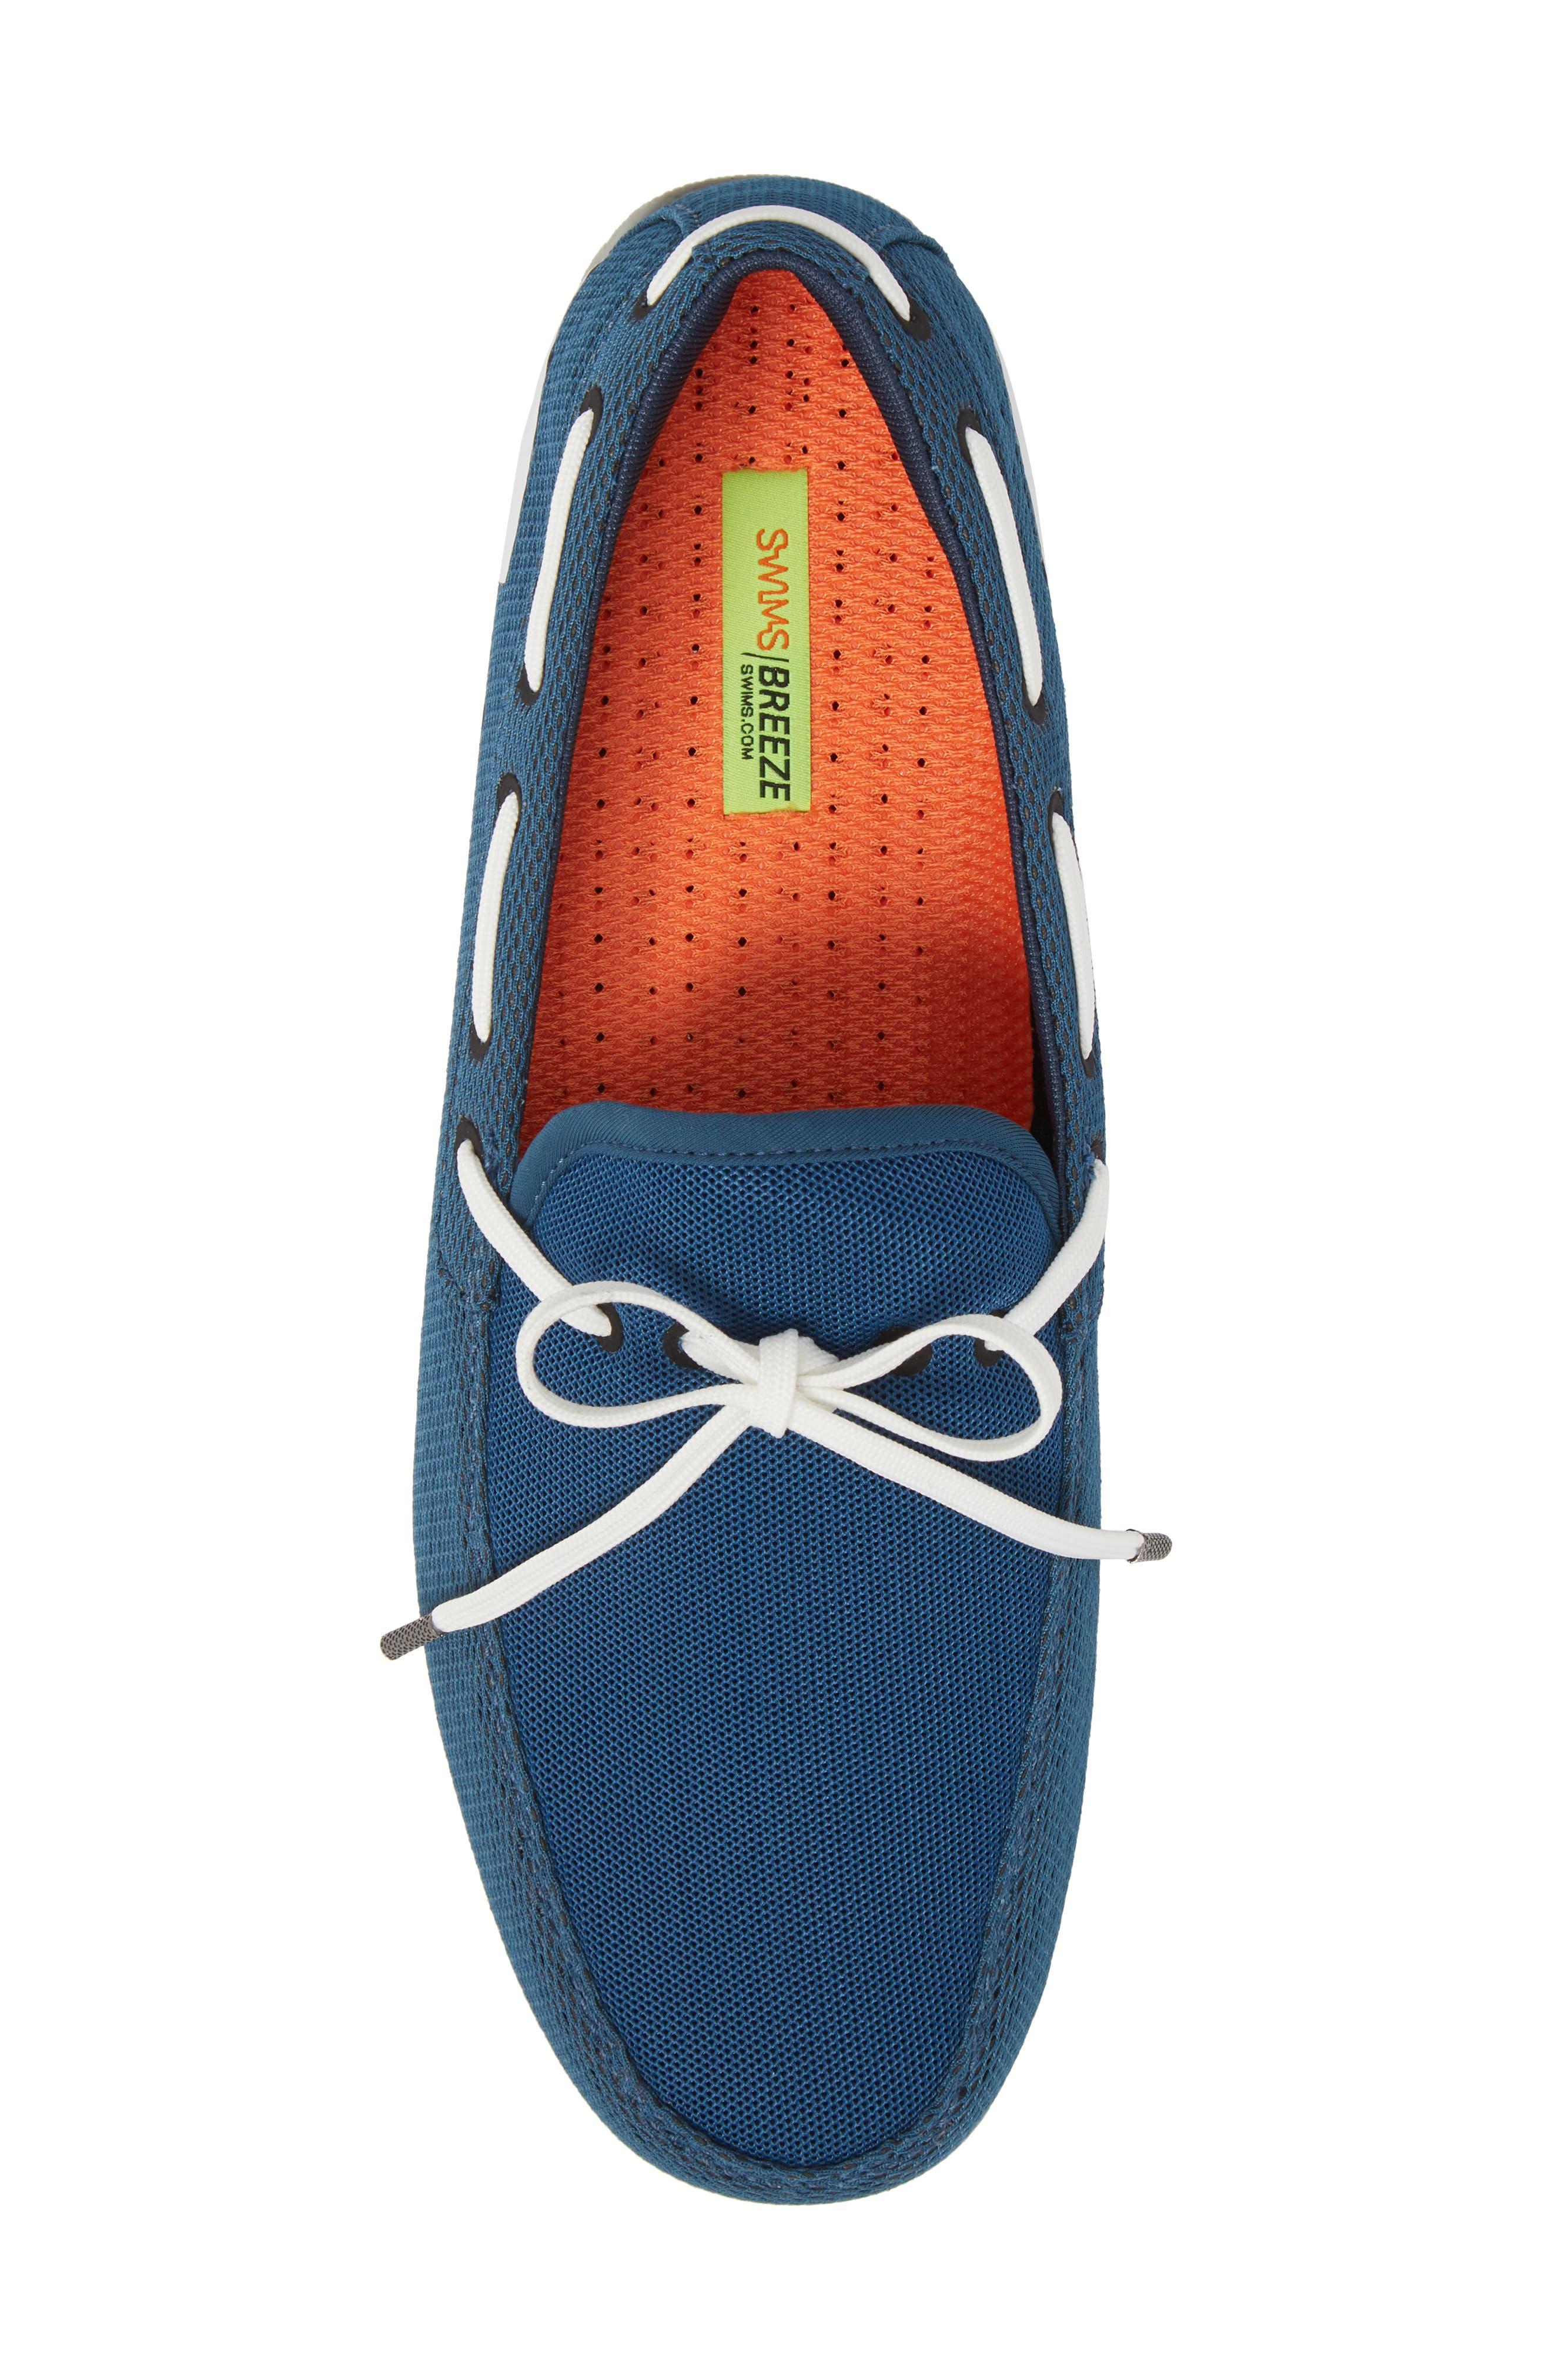 Breeze Loafer,                             Alternate thumbnail 5, color,                             Blue/ White